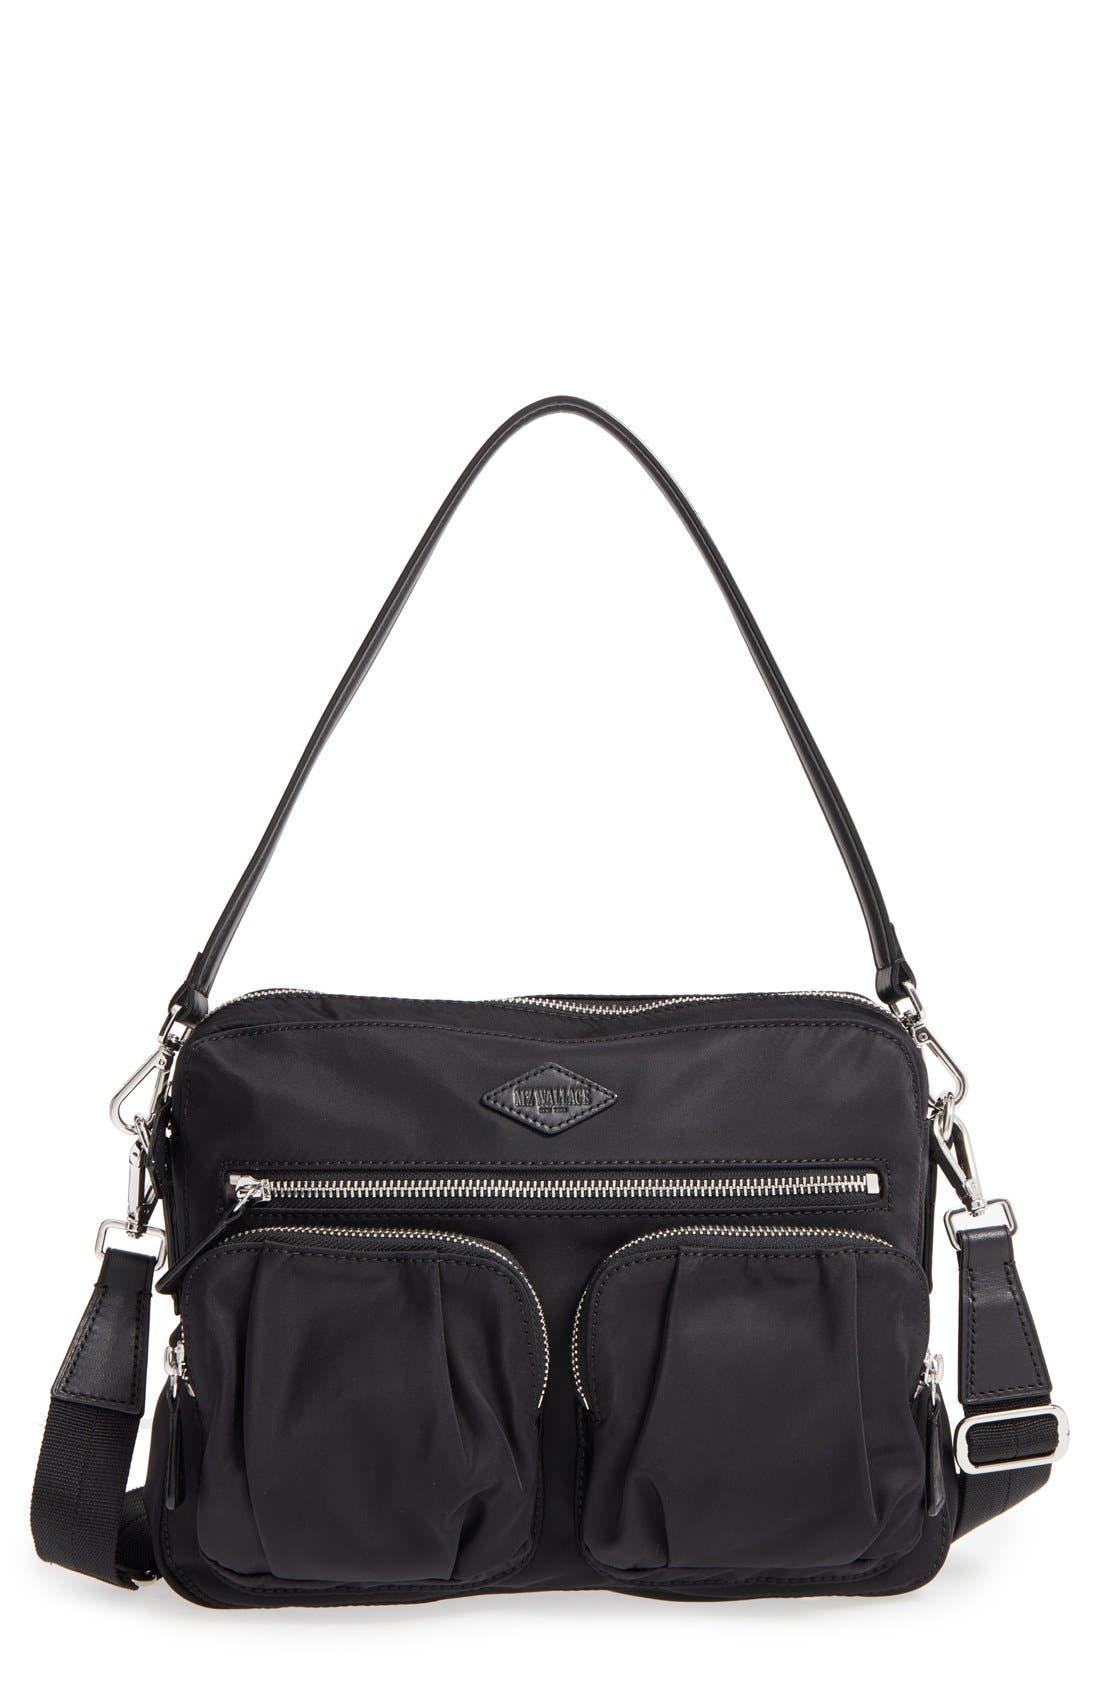 MZ Wallace 'Small Roxy' Bedford Nylon Shoulder Bag | Nordstrom